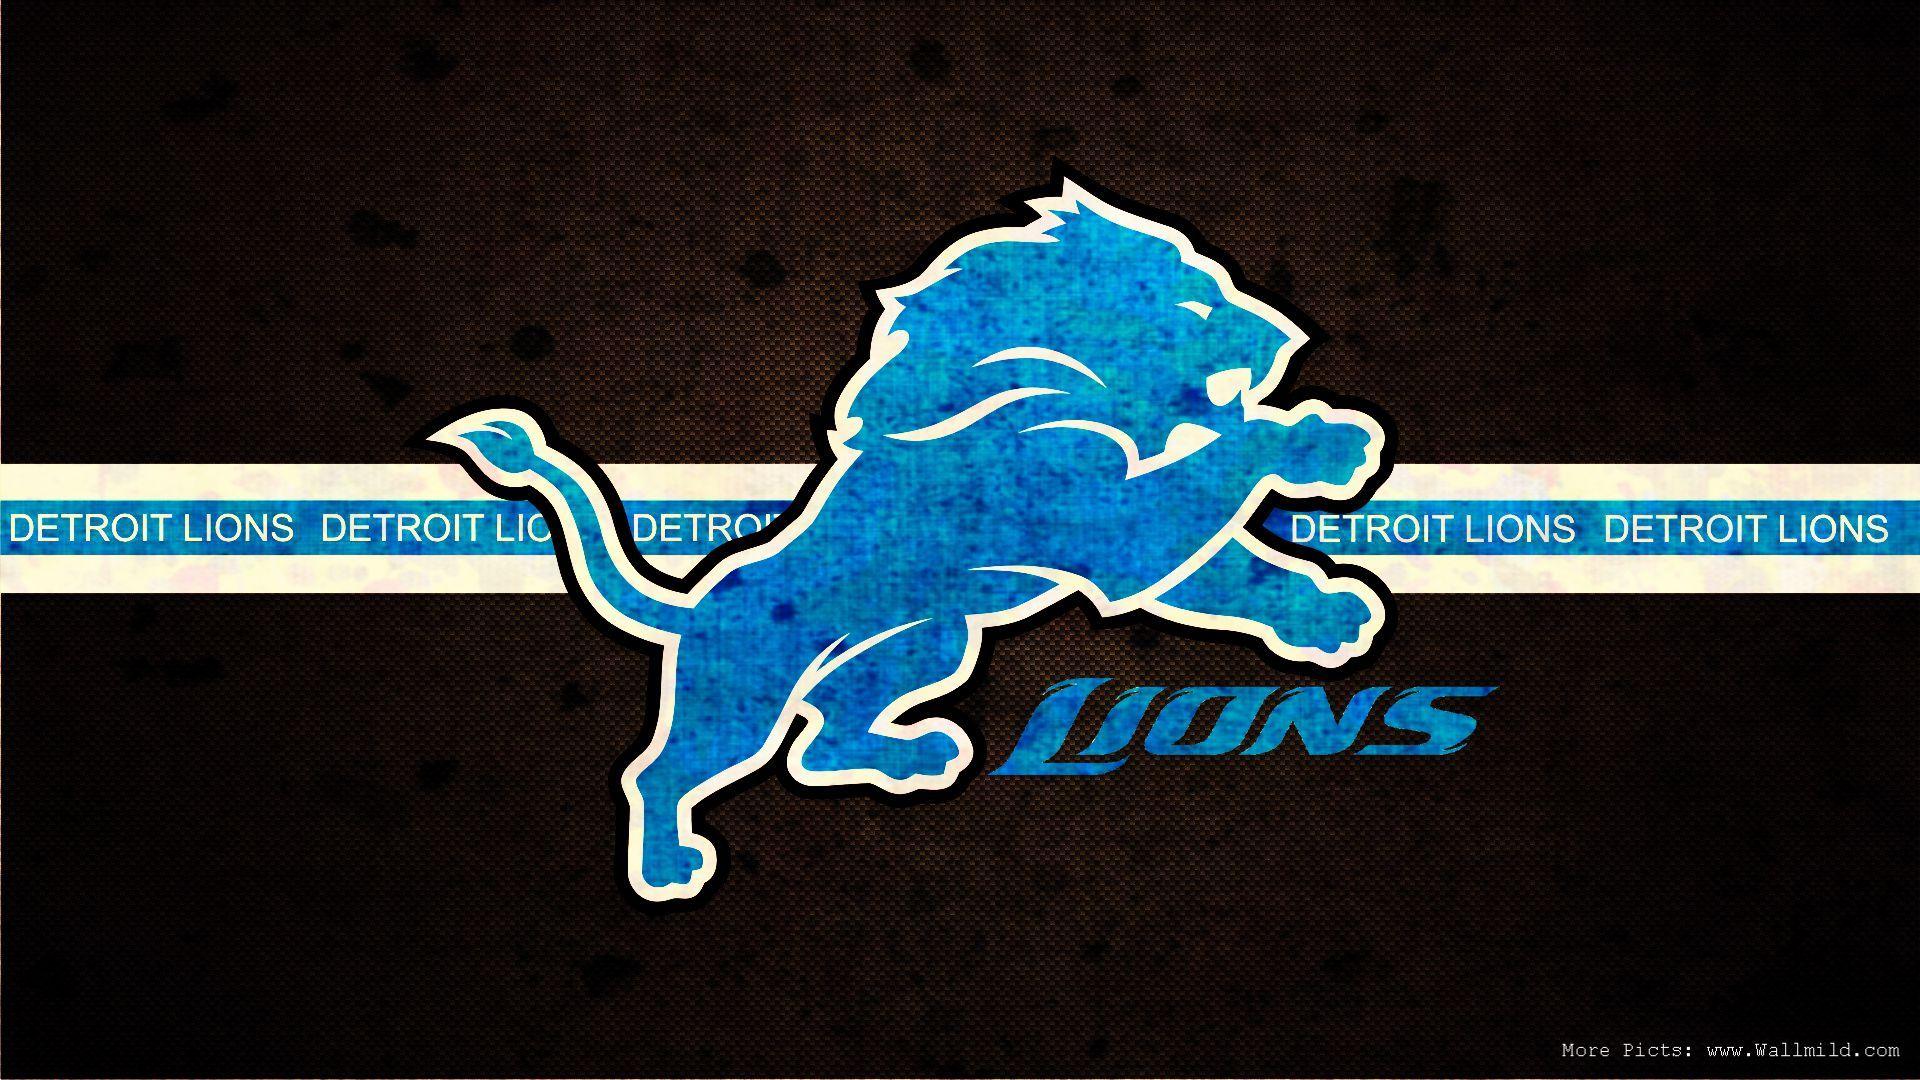 Detroit Lions Wallpaper 1B1   Hd Wallpaper, Blue Wallpaper ...